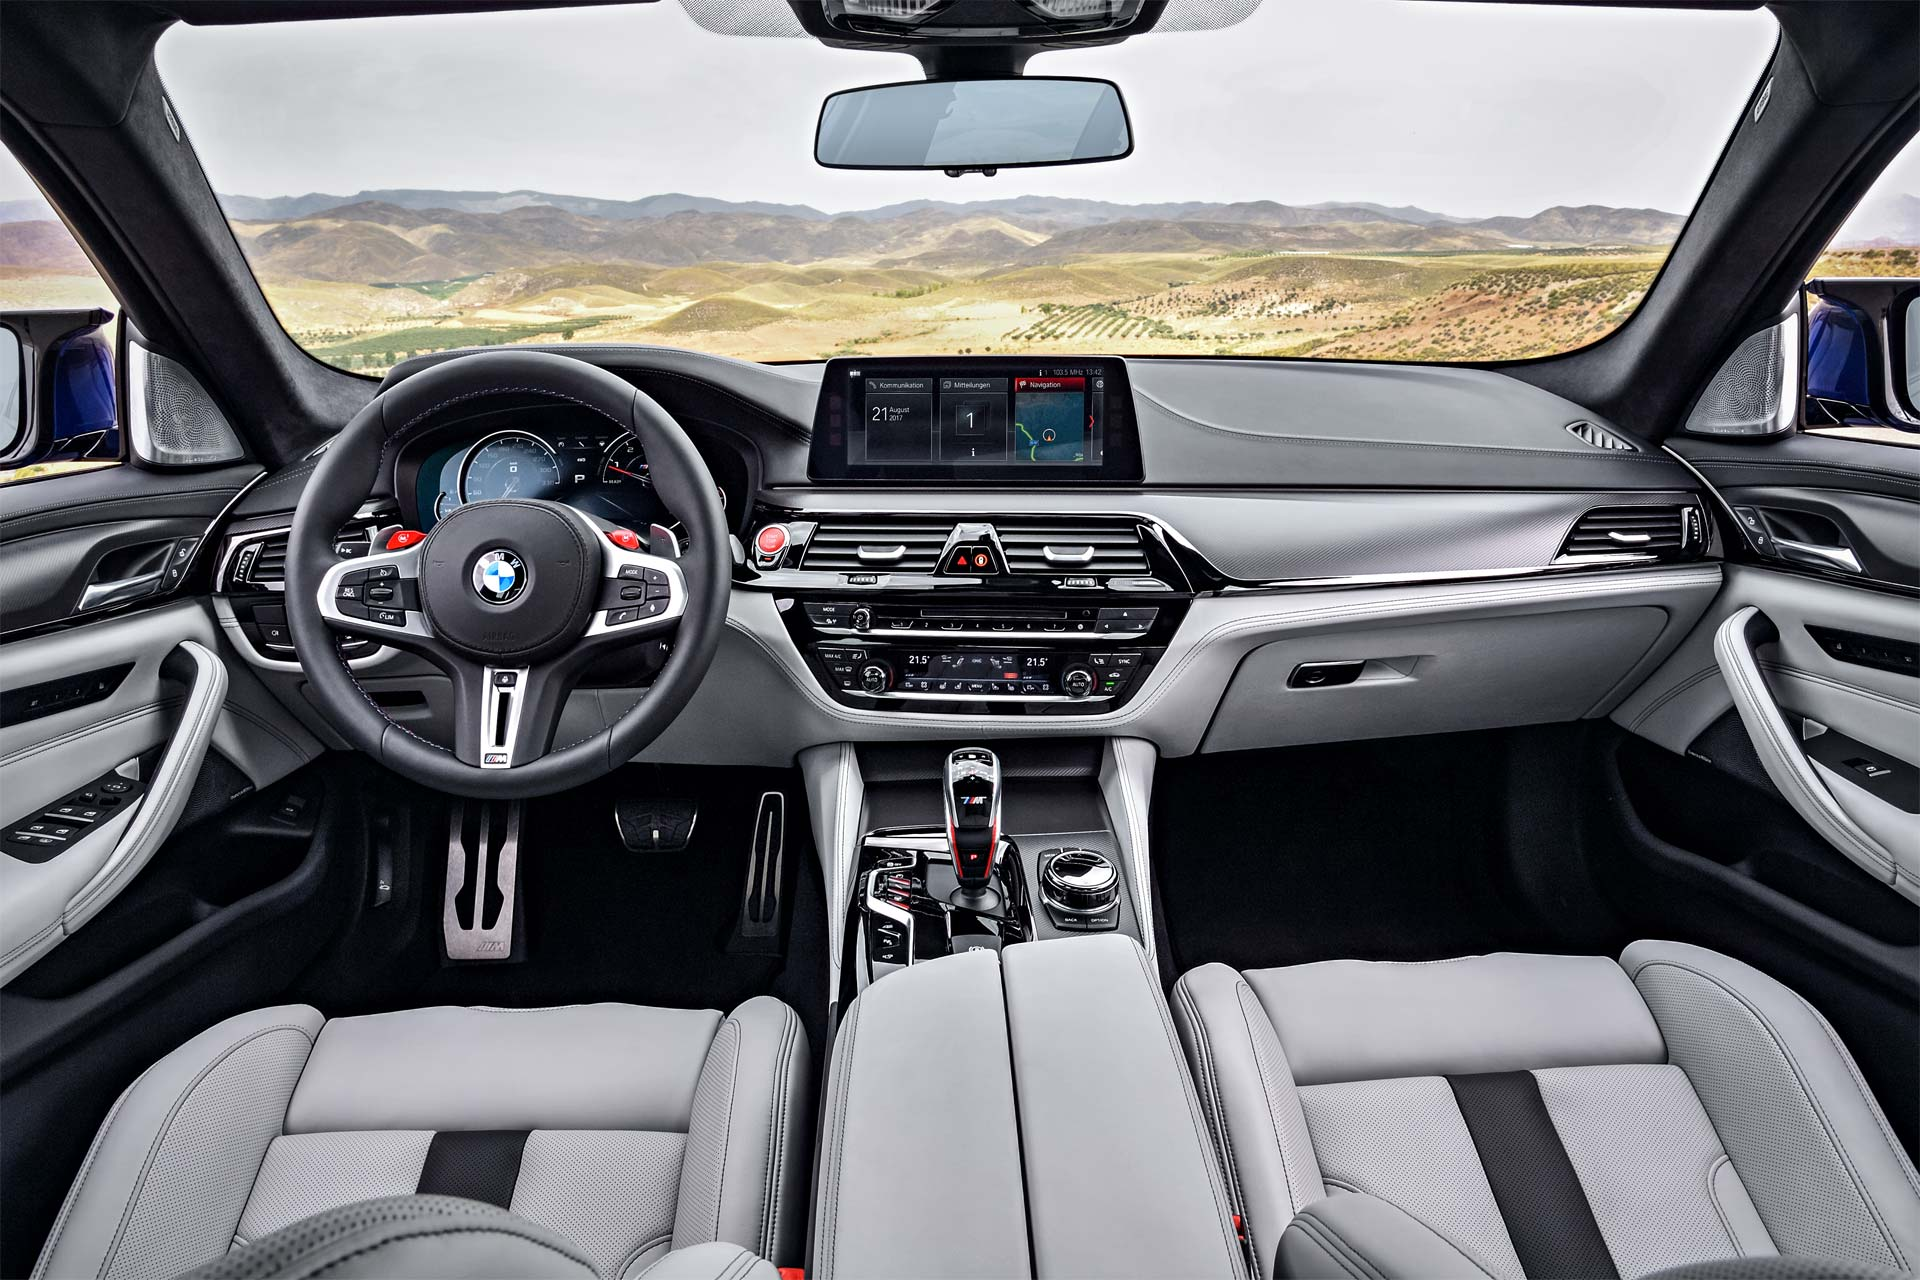 2018-BMW-M5-interior